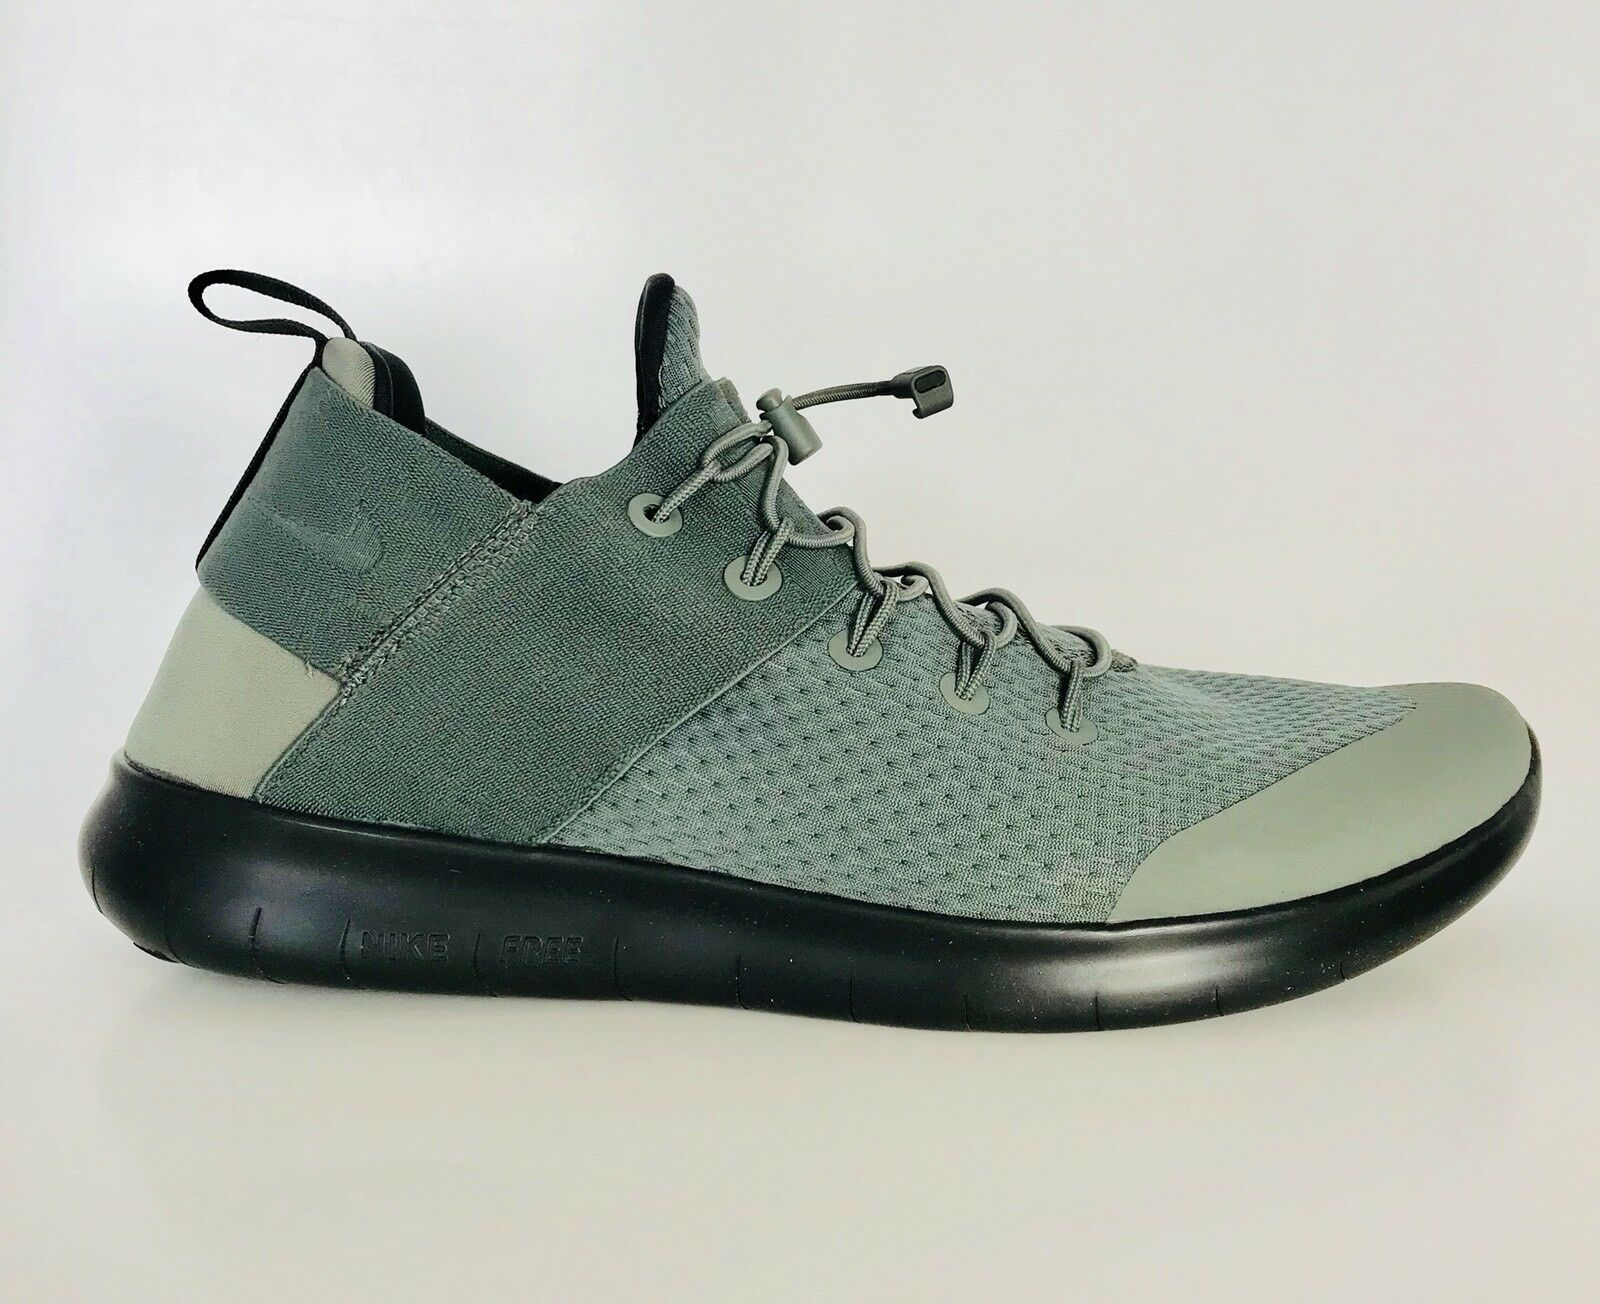 Nike Men's Free RN 880841-013 Size 10.5 Running Athletic Khaki Shoes Khaki Athletic Green New 7e1afe